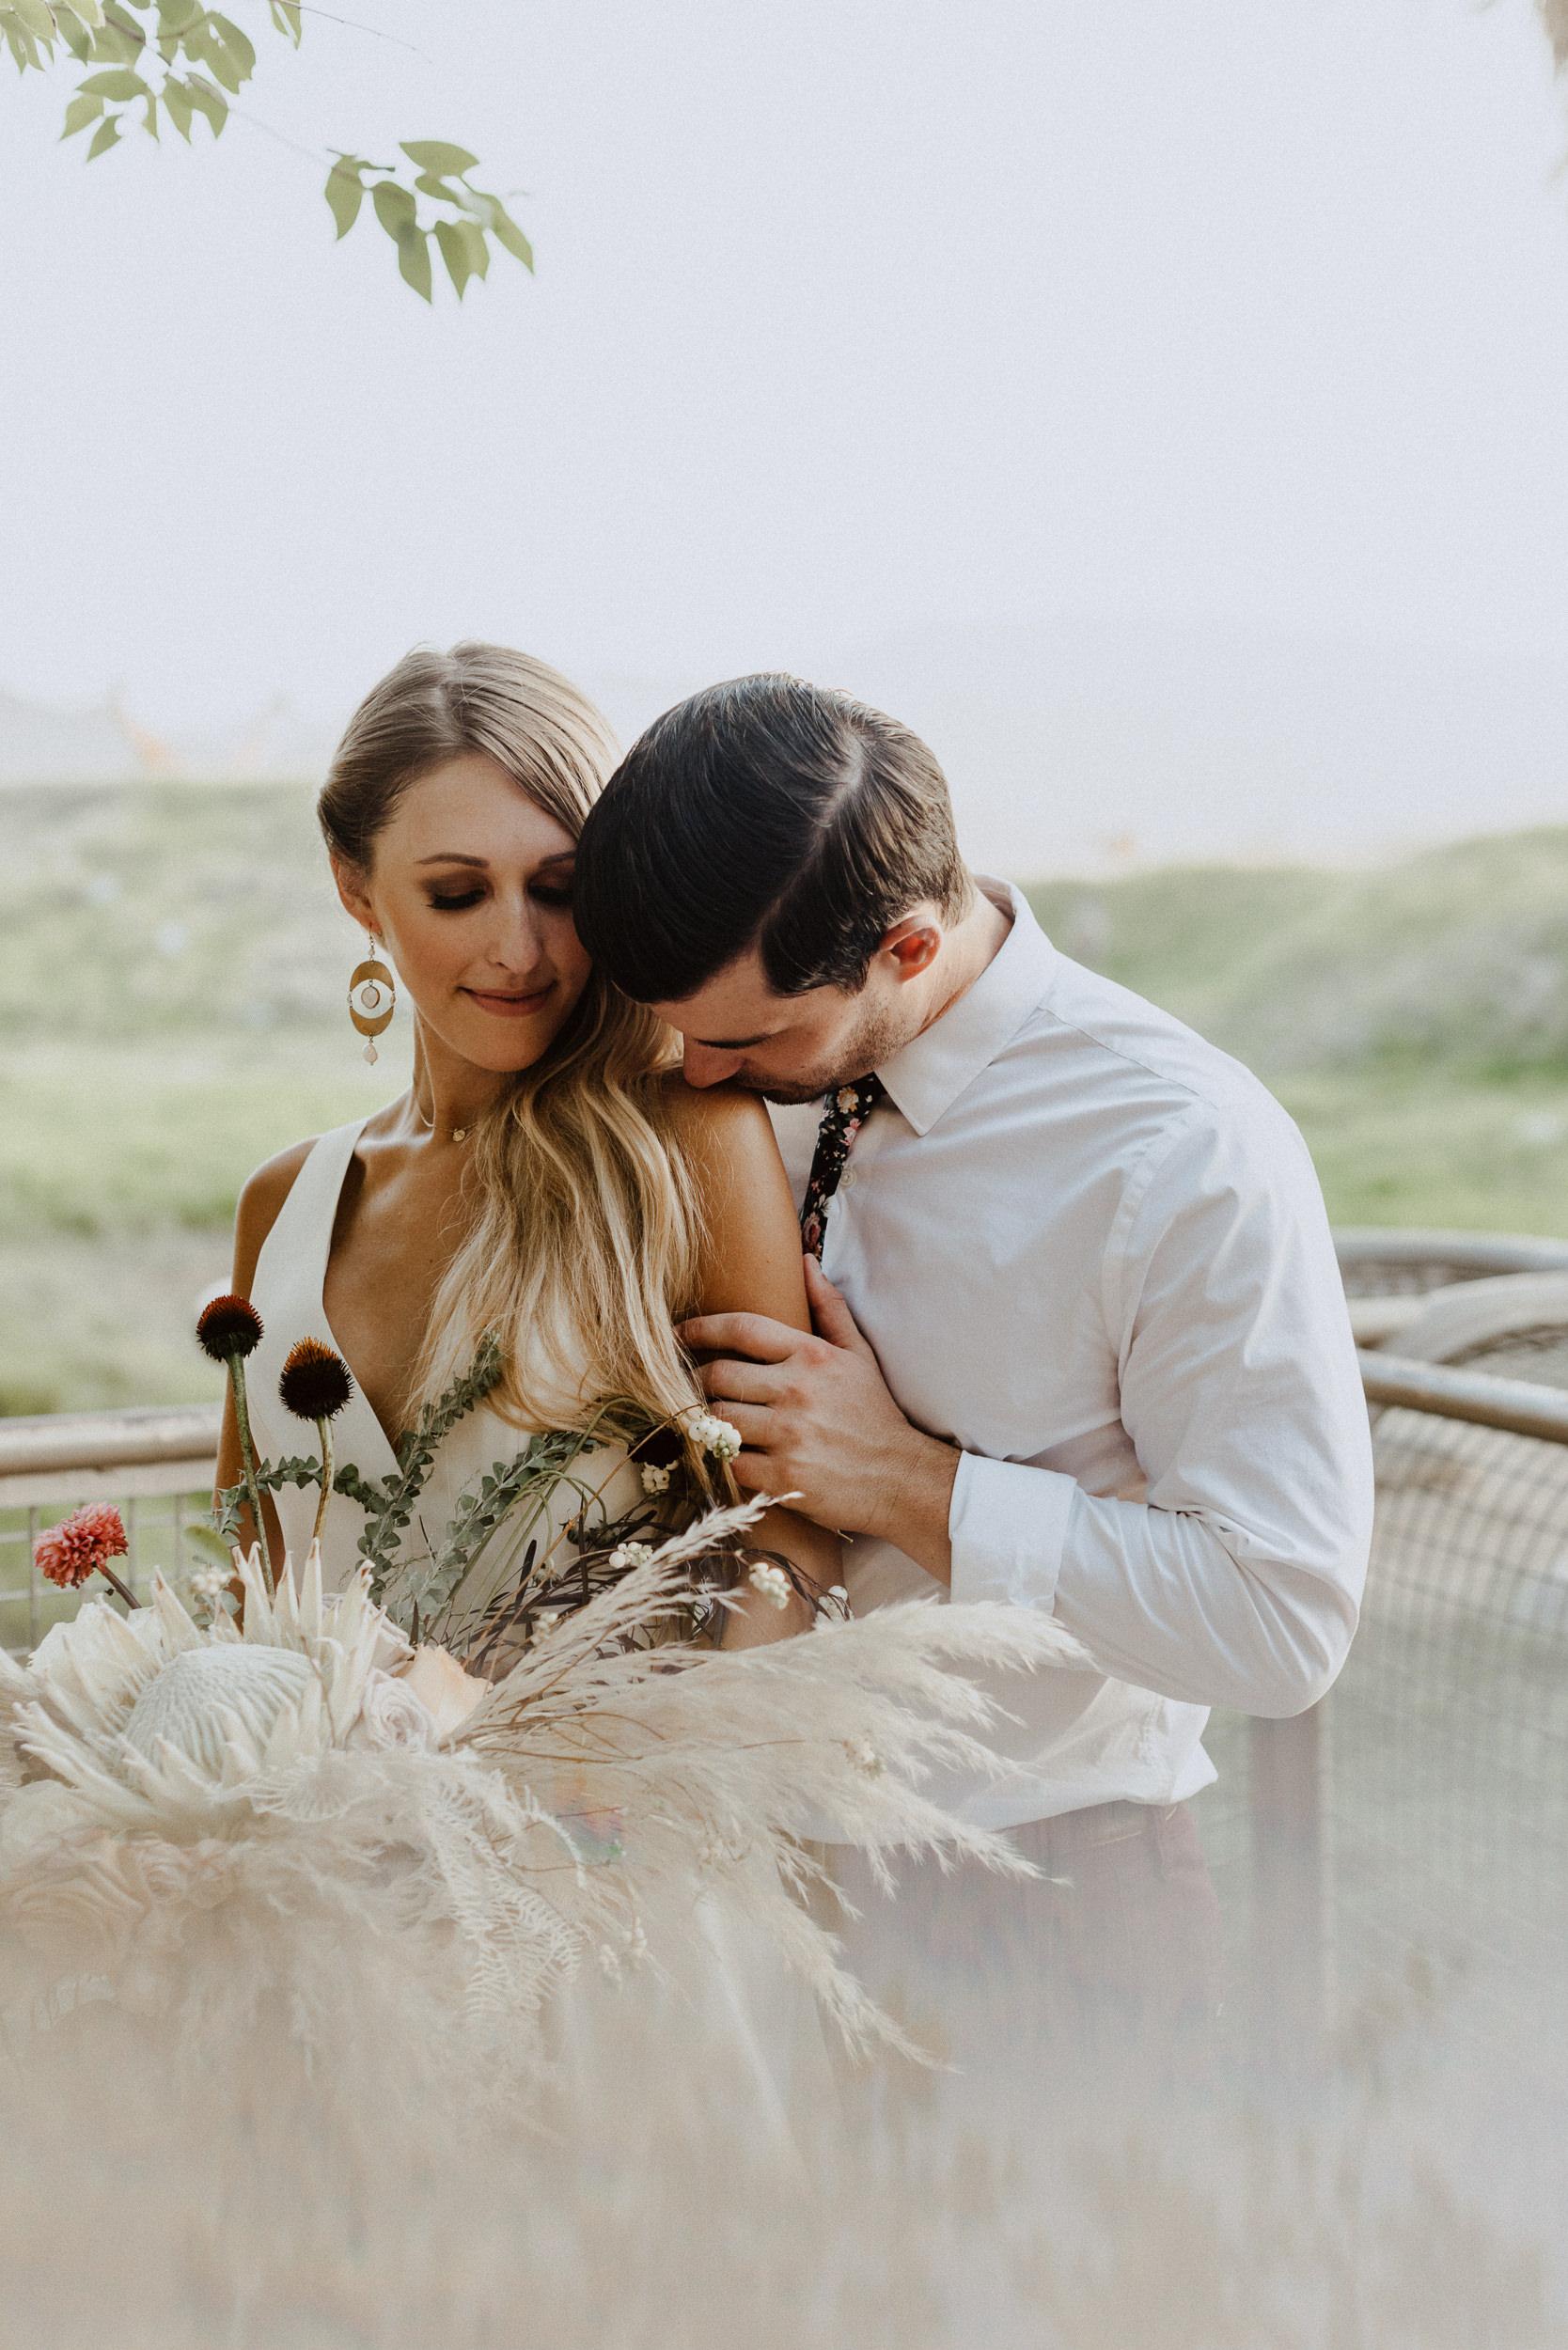 sChelsie + Chris - The Desert Shootout Wedding Romantics at The Living Desert-161.jpg